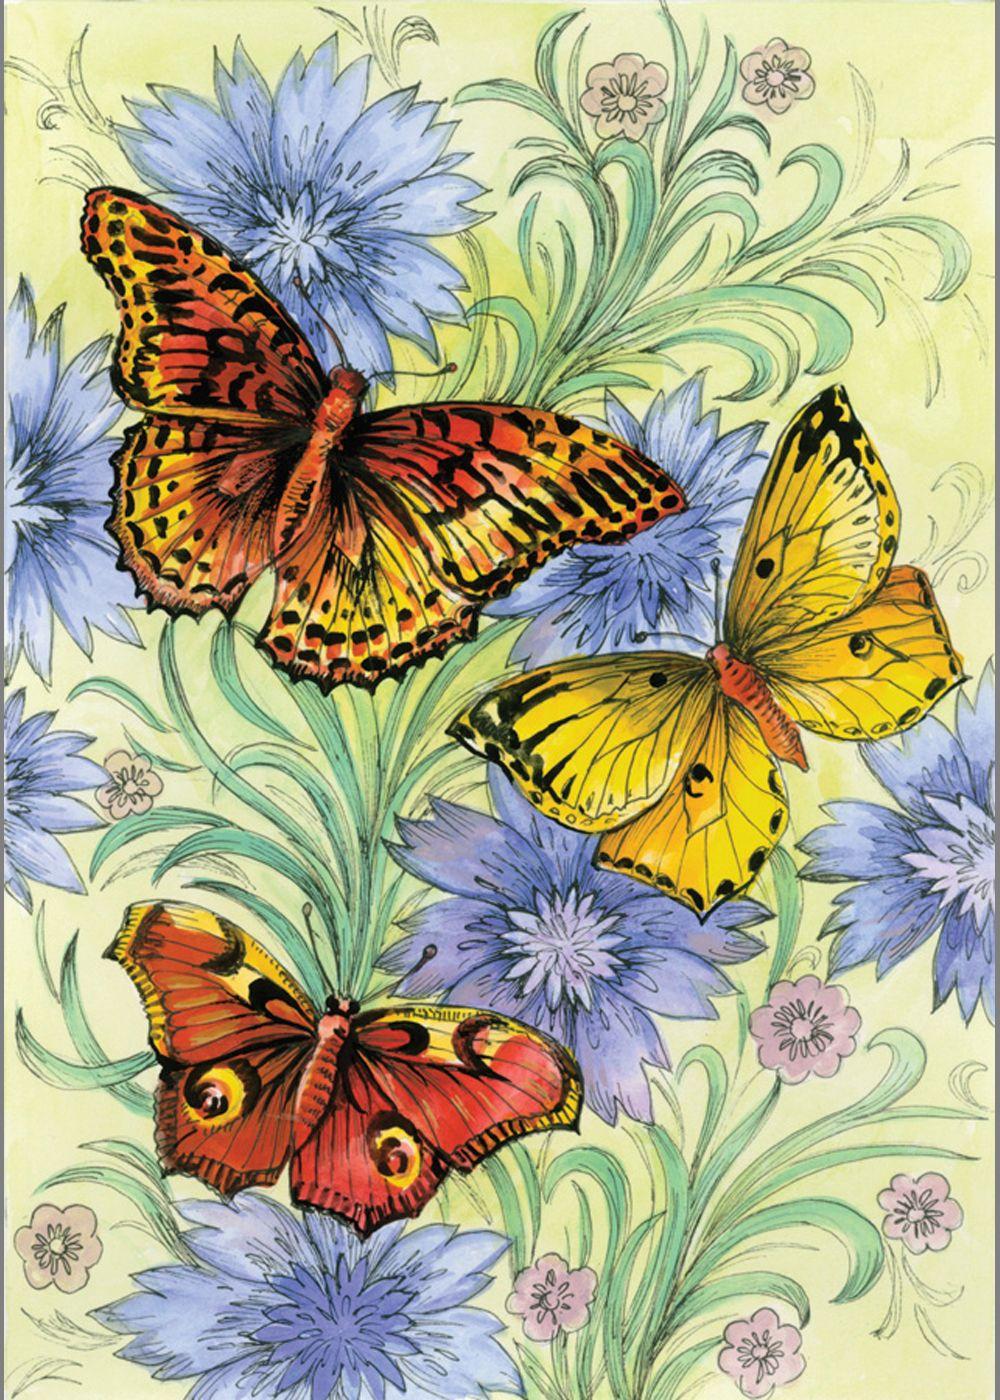 https://www.madaboutgardening.com/store/images/5362/1154-Butterflies-&-Flowers-flag.jpg